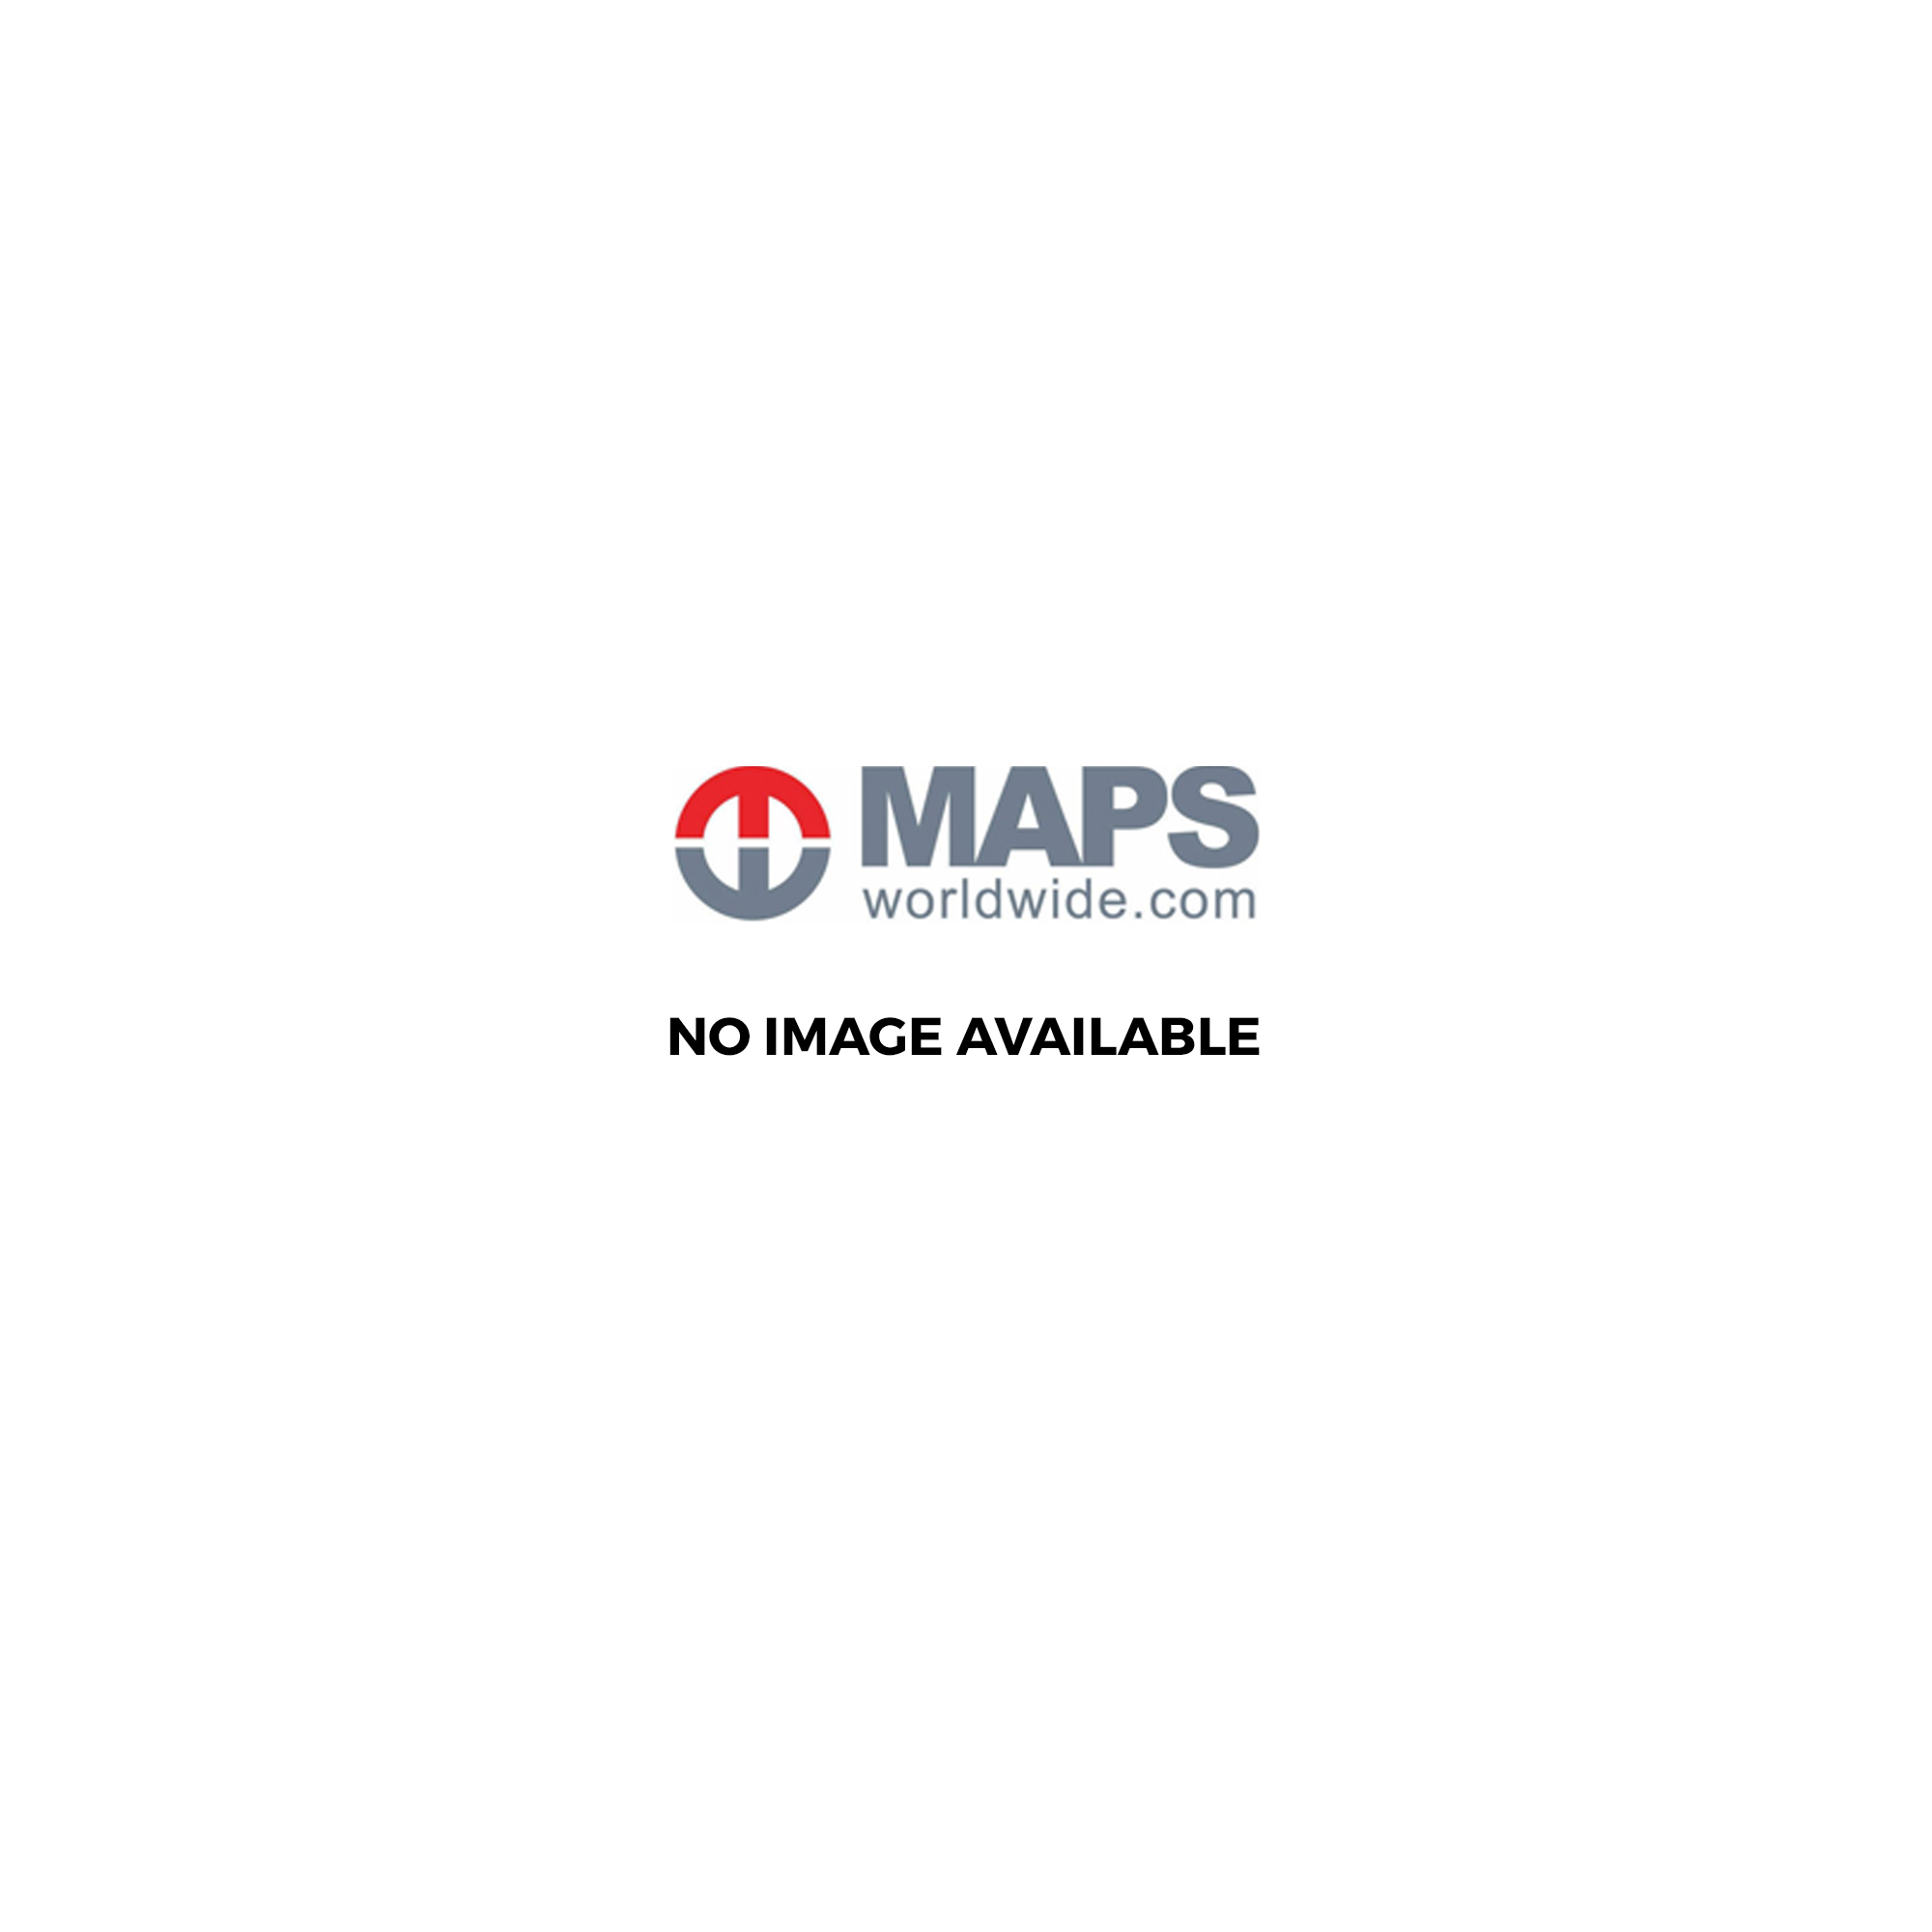 Kompass Map 2472 Marsciano Todi Terni Orvieto Amelia Narni Europe